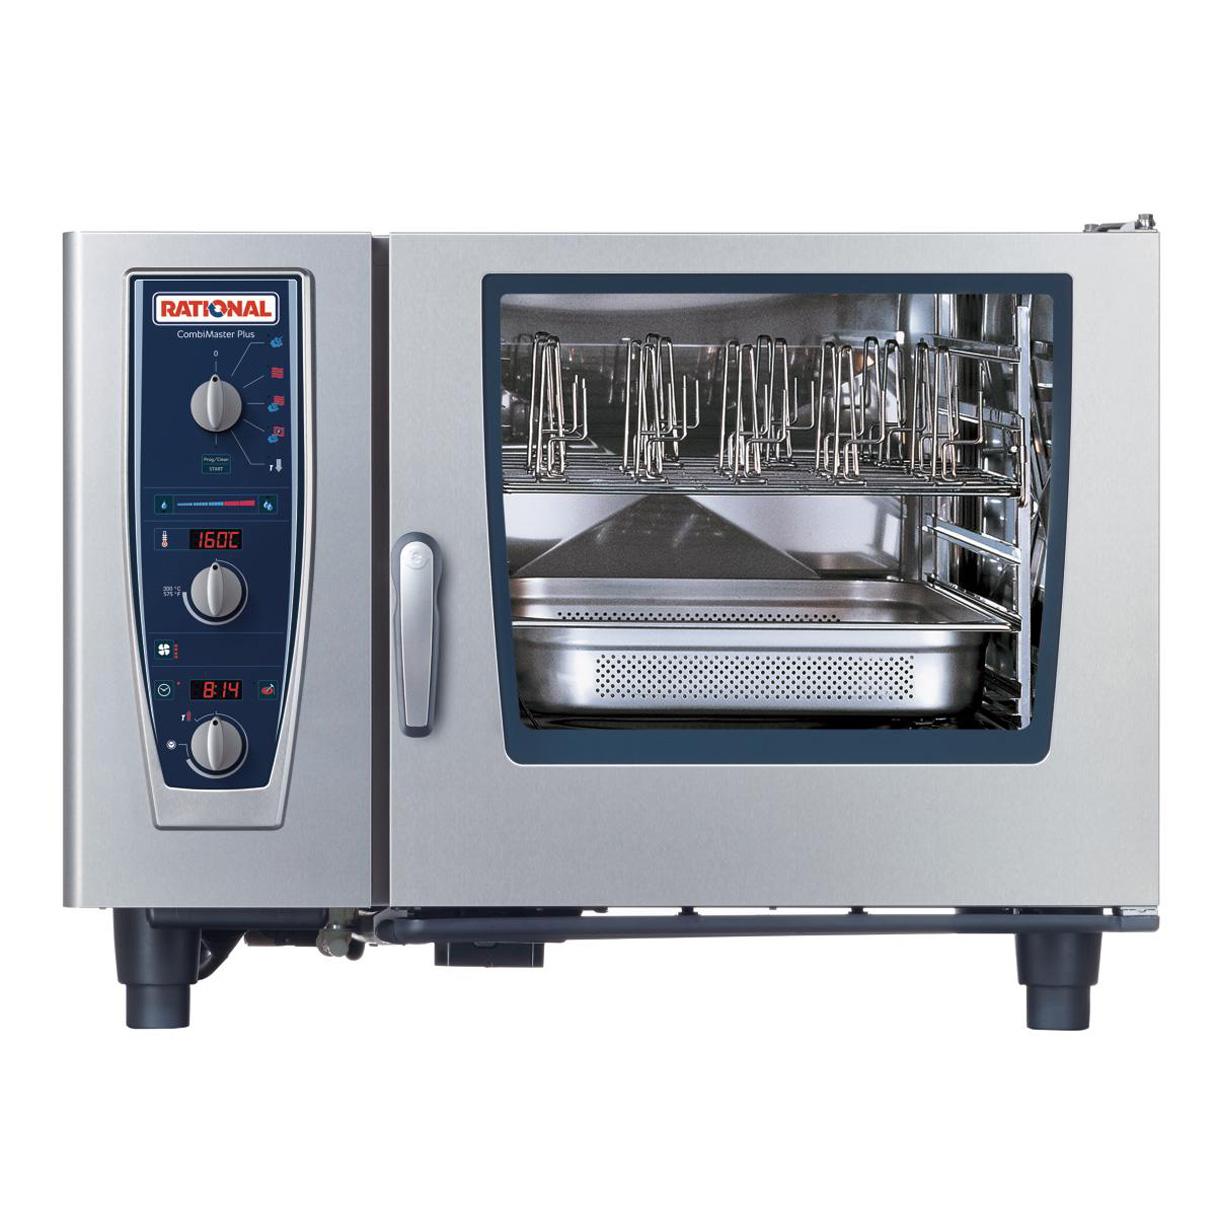 RATIONAL B629206.19E202 combi oven, gas